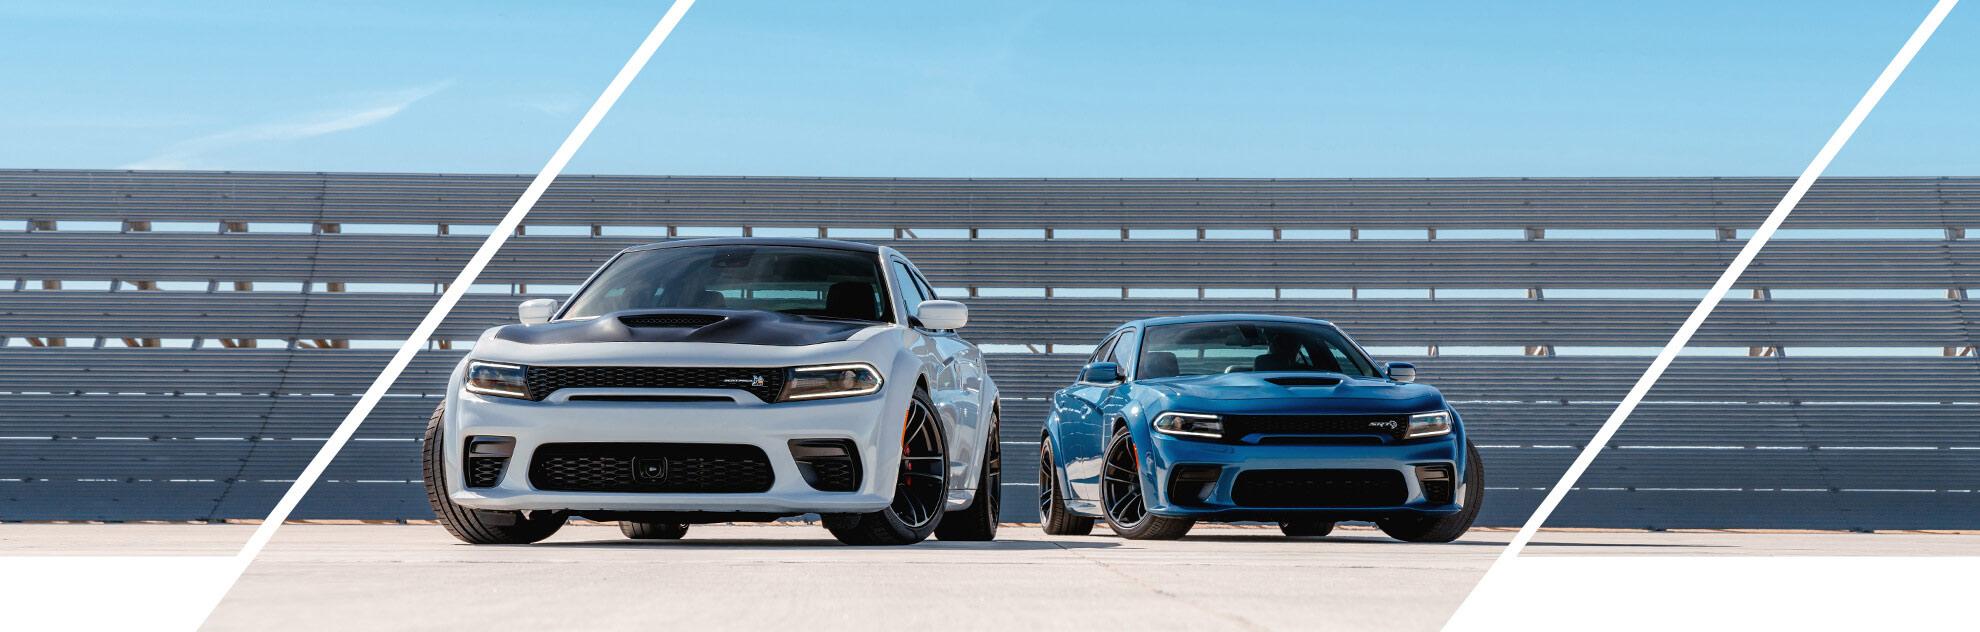 Kelebihan Chevrolet Charger Perbandingan Harga